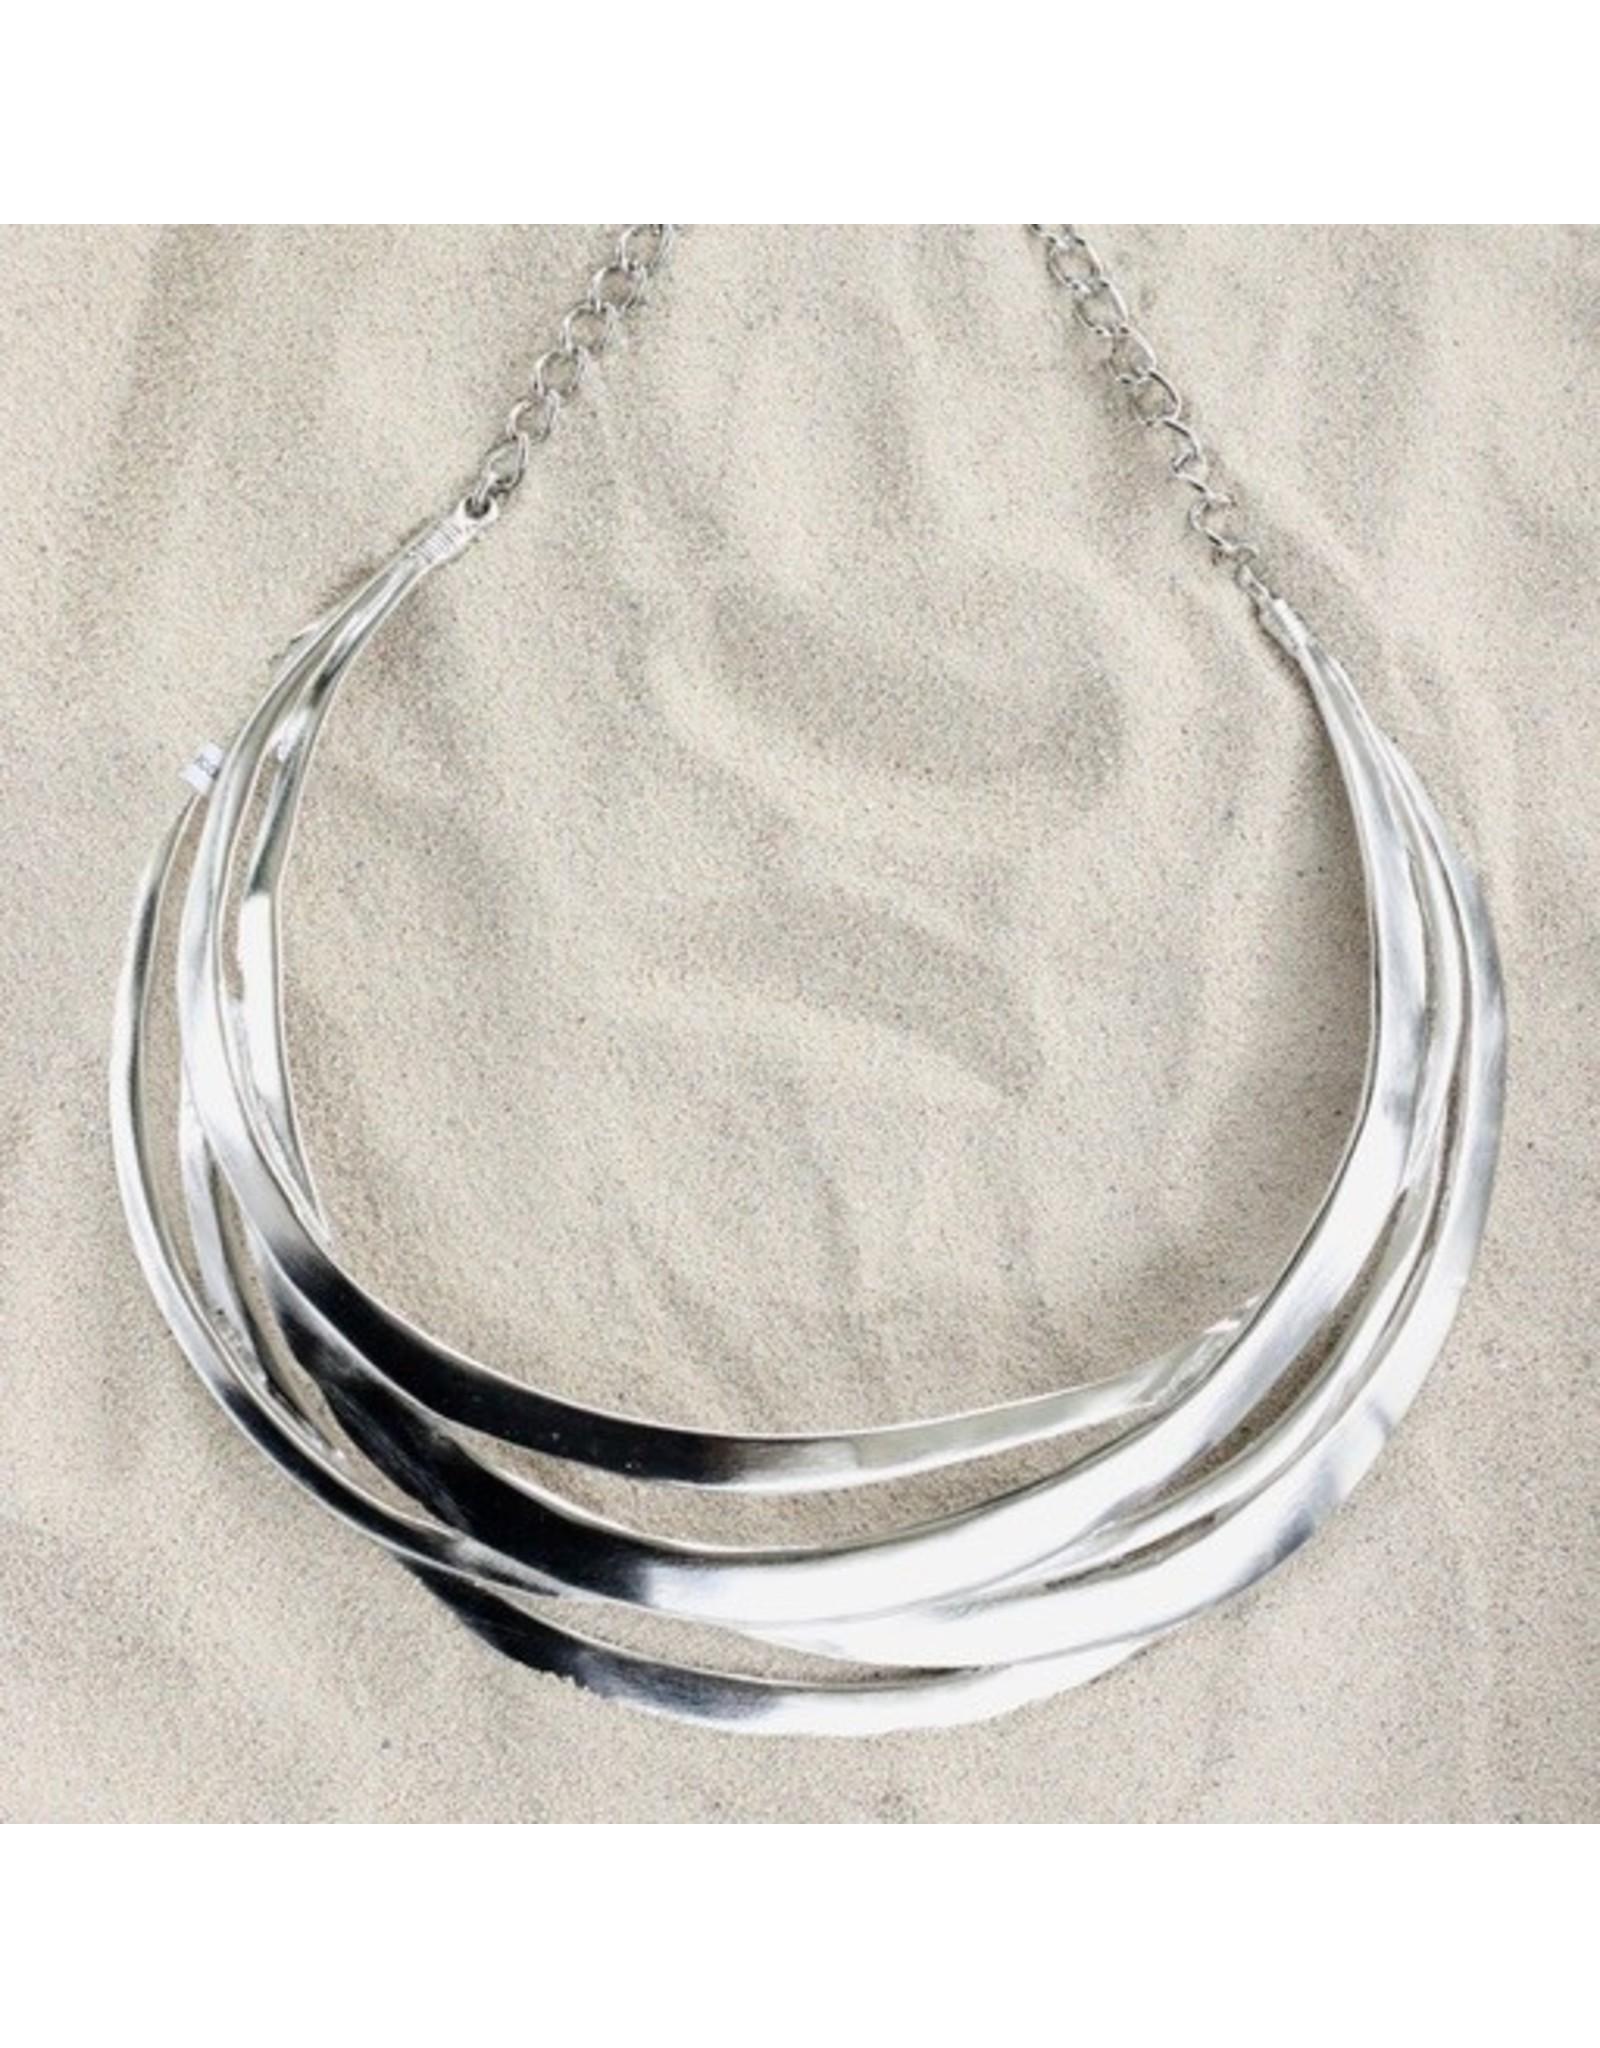 Kenneth Jay Lane KJLane: Cutout Collar Silver